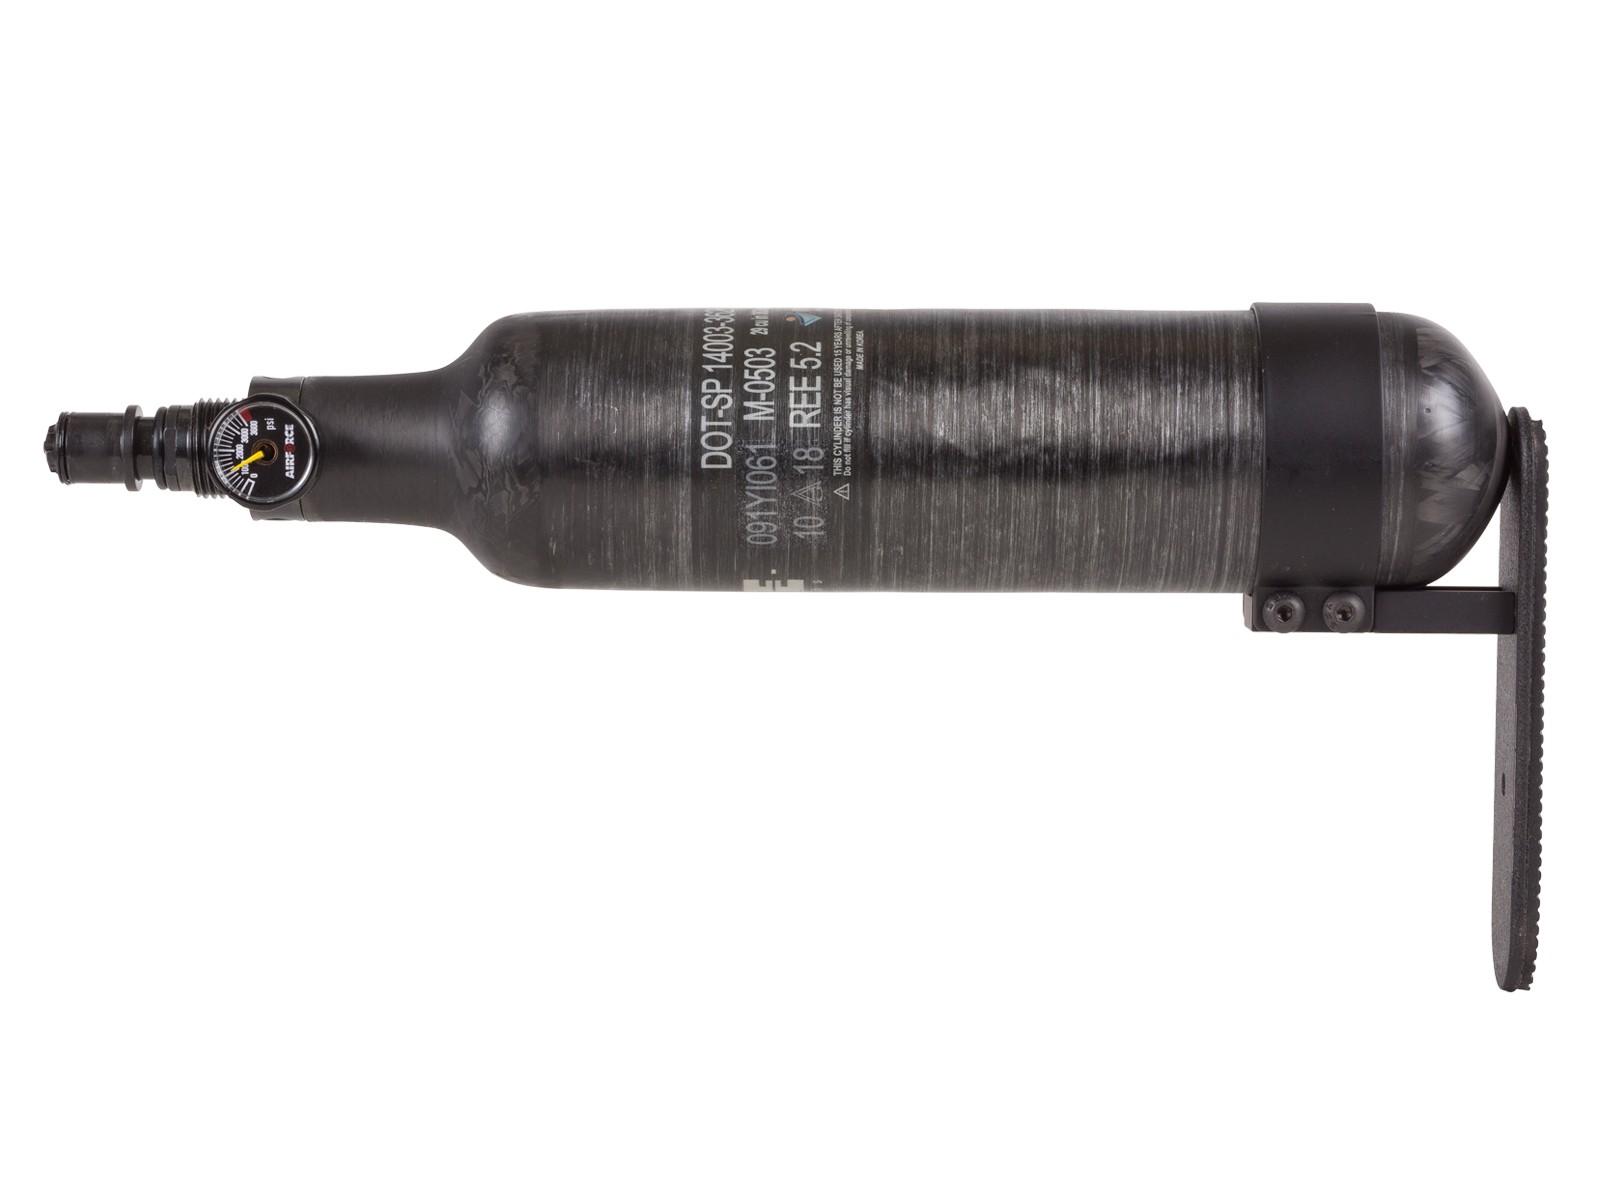 AirForce Carbon Fiber Spare Tank, Spin Loc, .457 Caliber